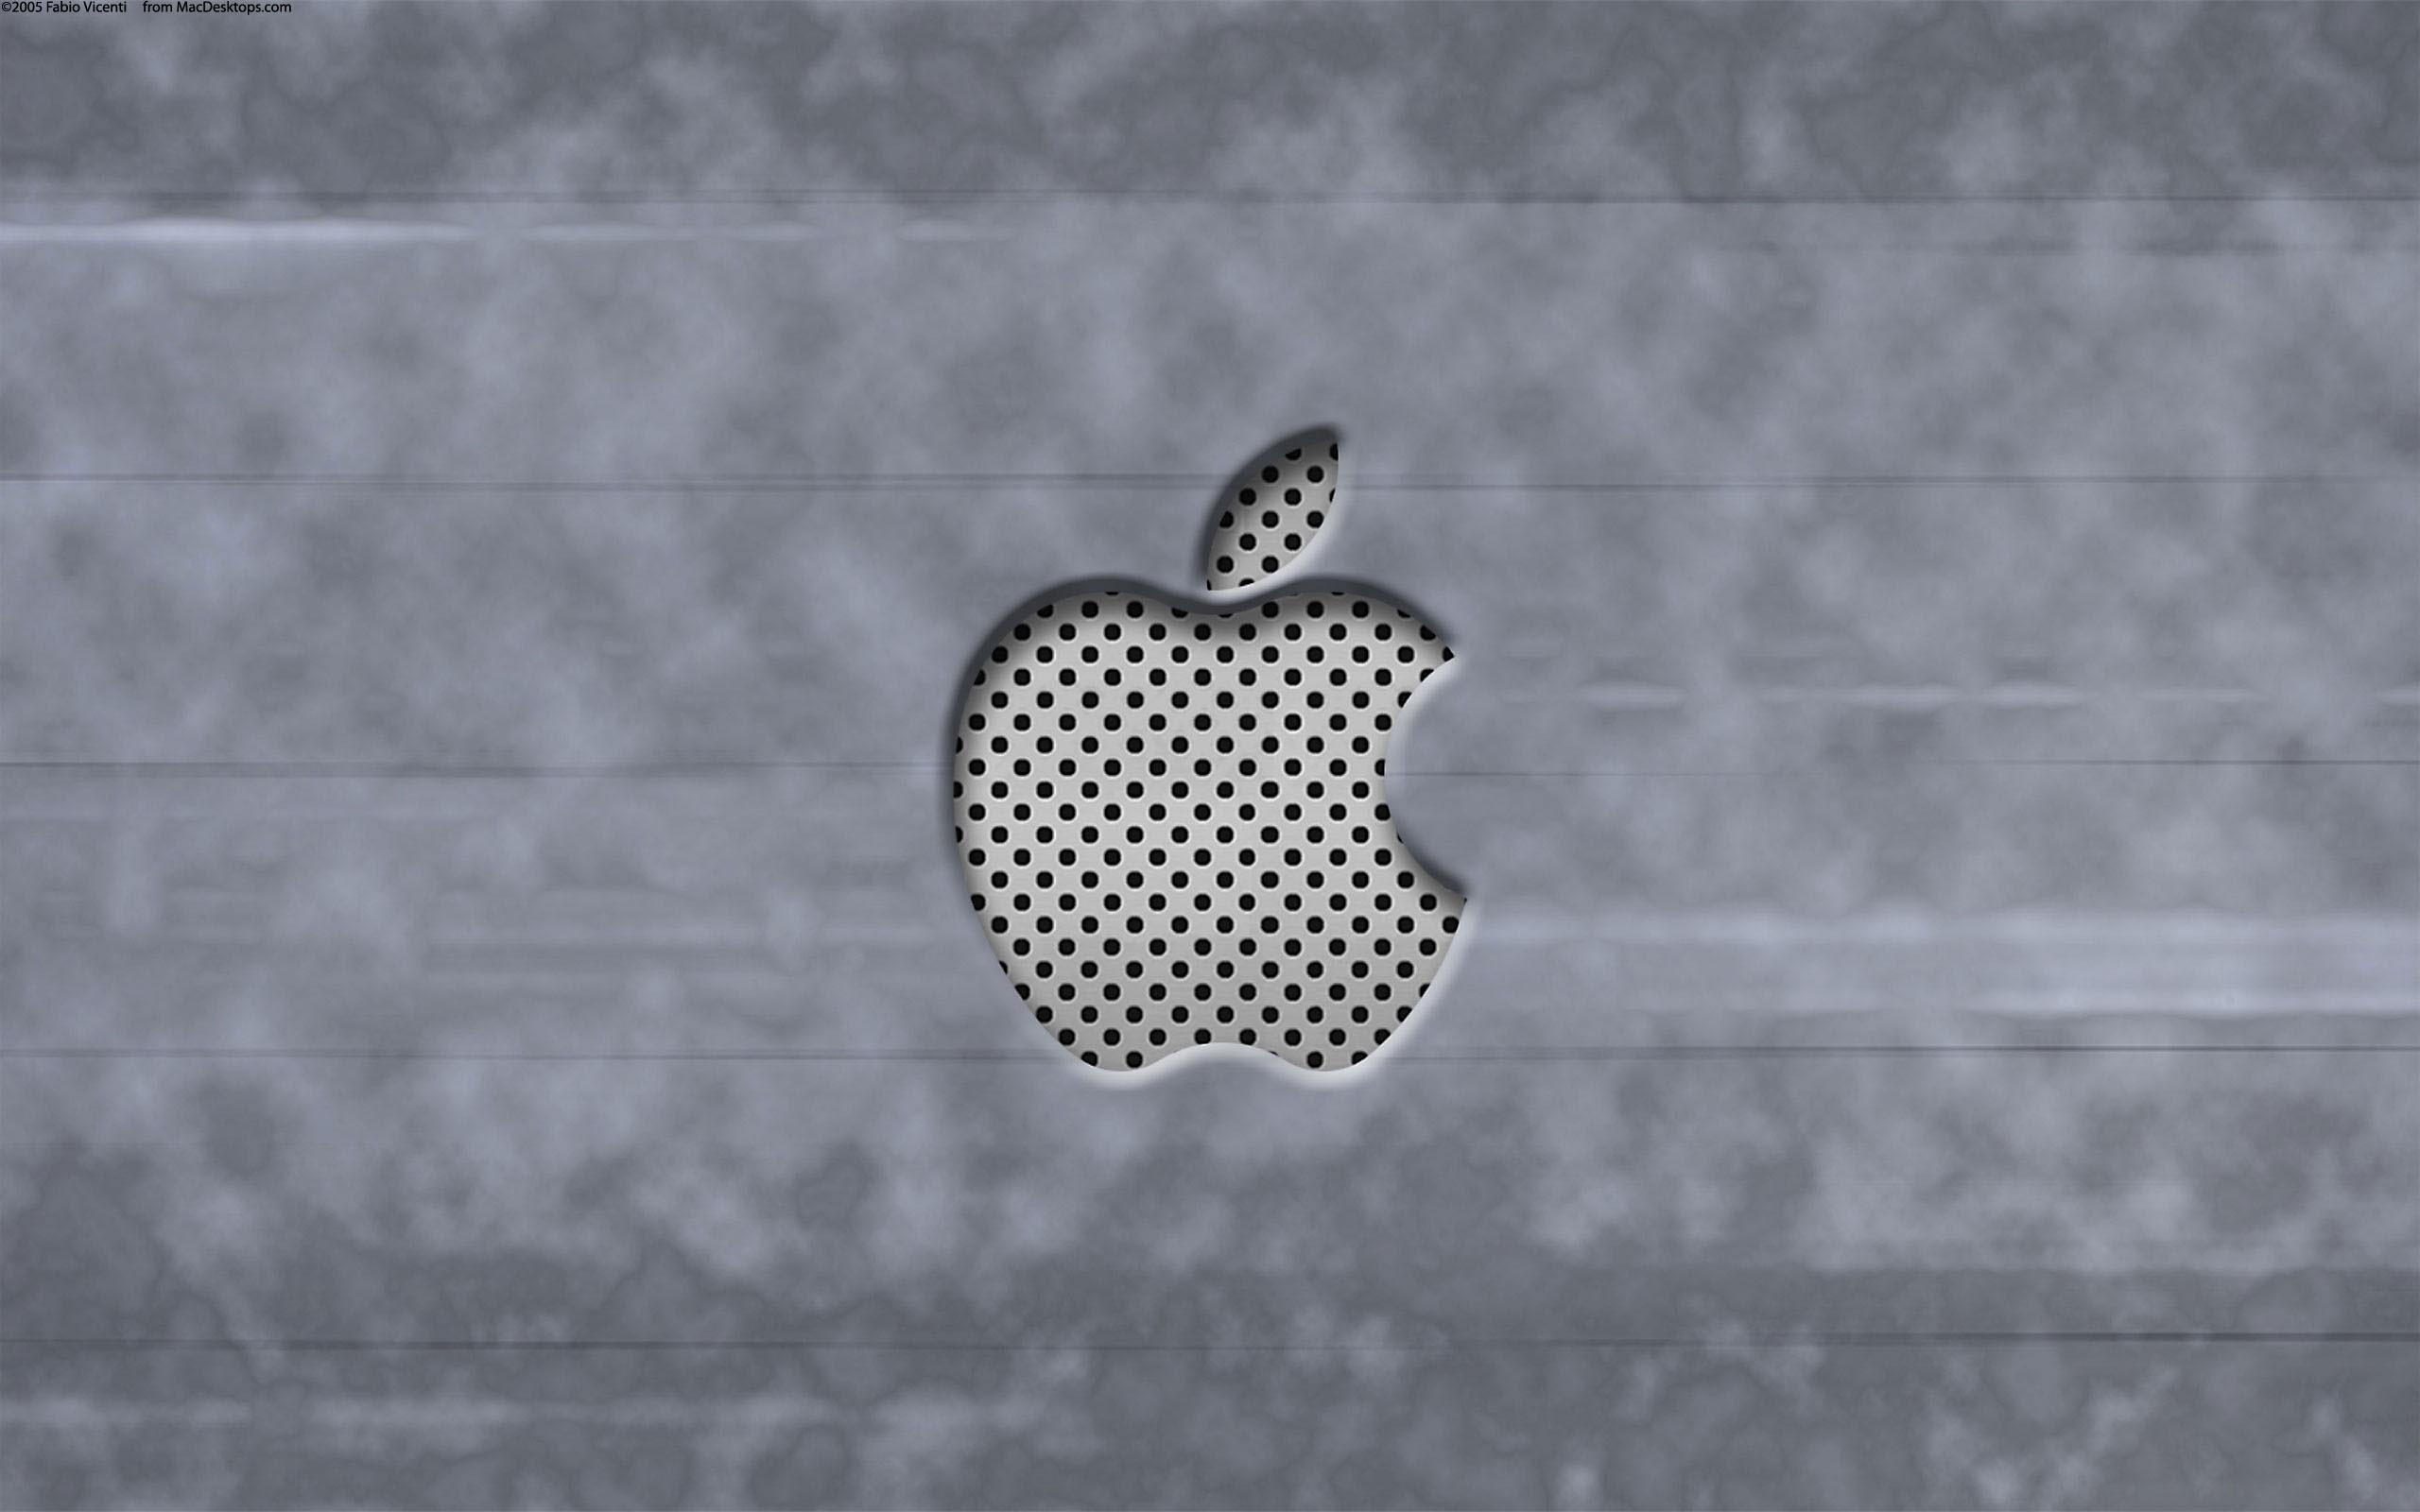 New Apple Wallpaper 2560x1600